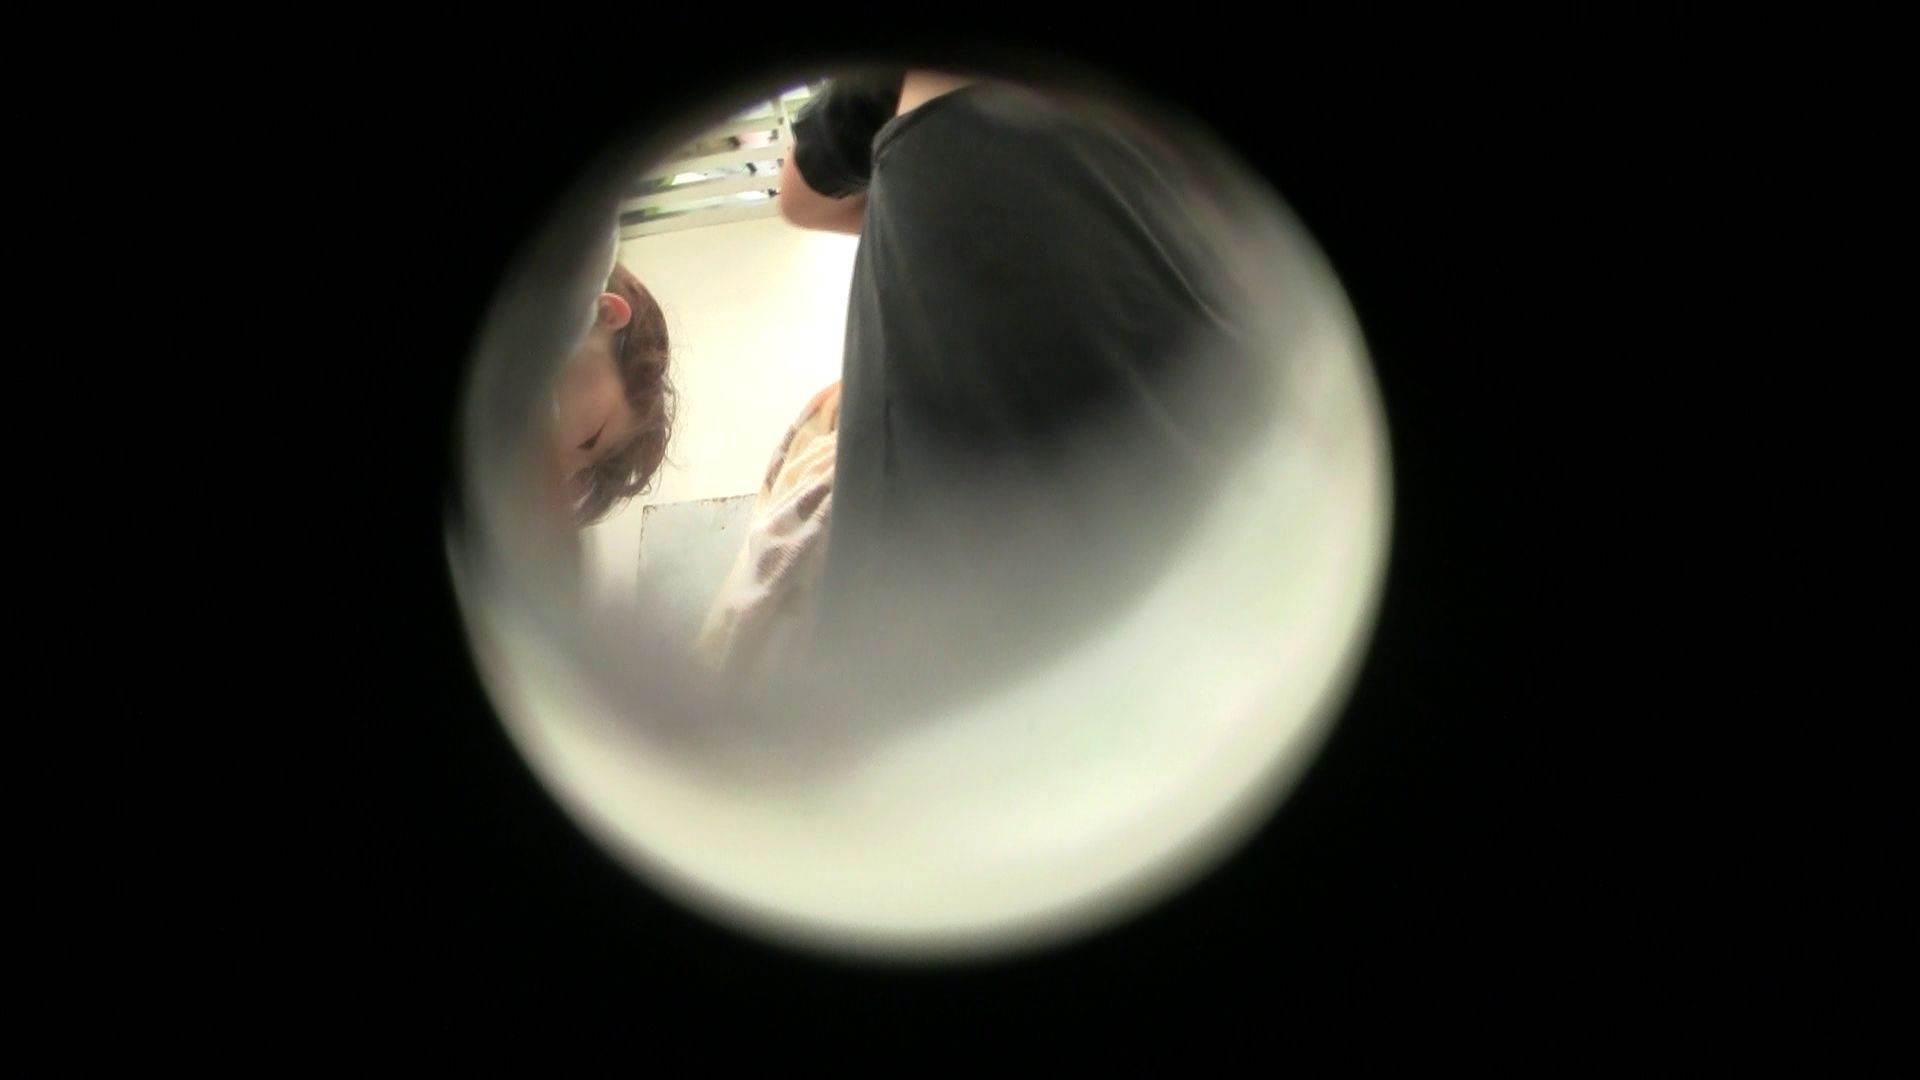 NO.43 乳首の先がチラ 背中でイメージして下さい チラ 盗み撮りAV無料動画キャプチャ 45pic 7